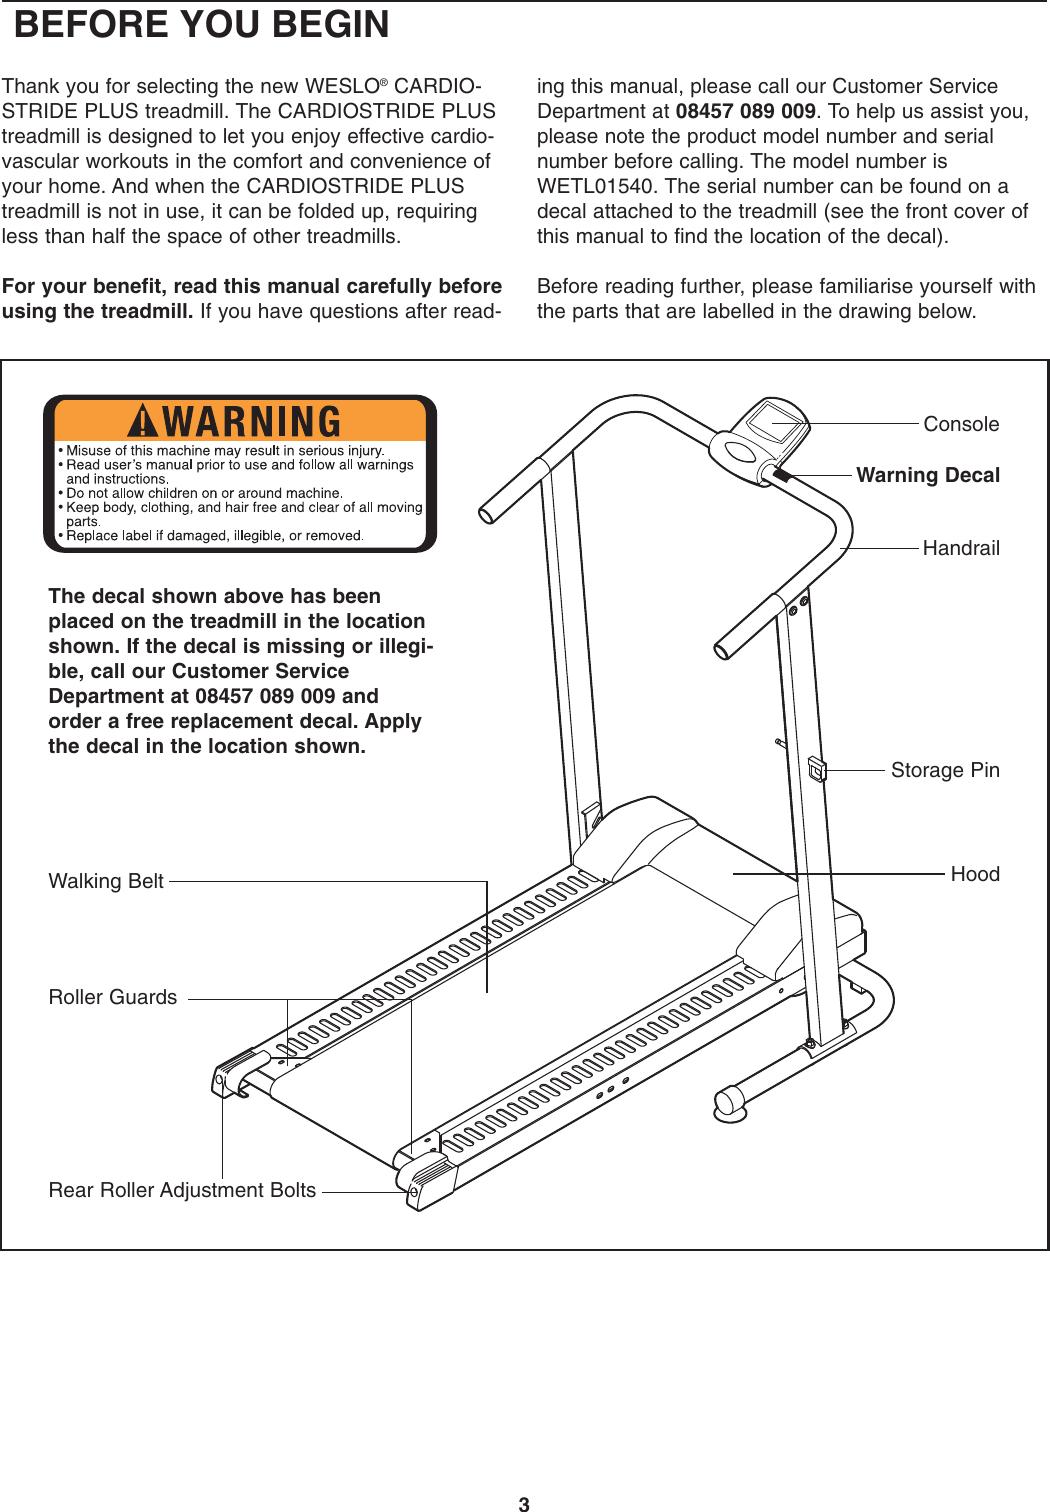 Weslo Treadmill Wetl01540 Users Manual